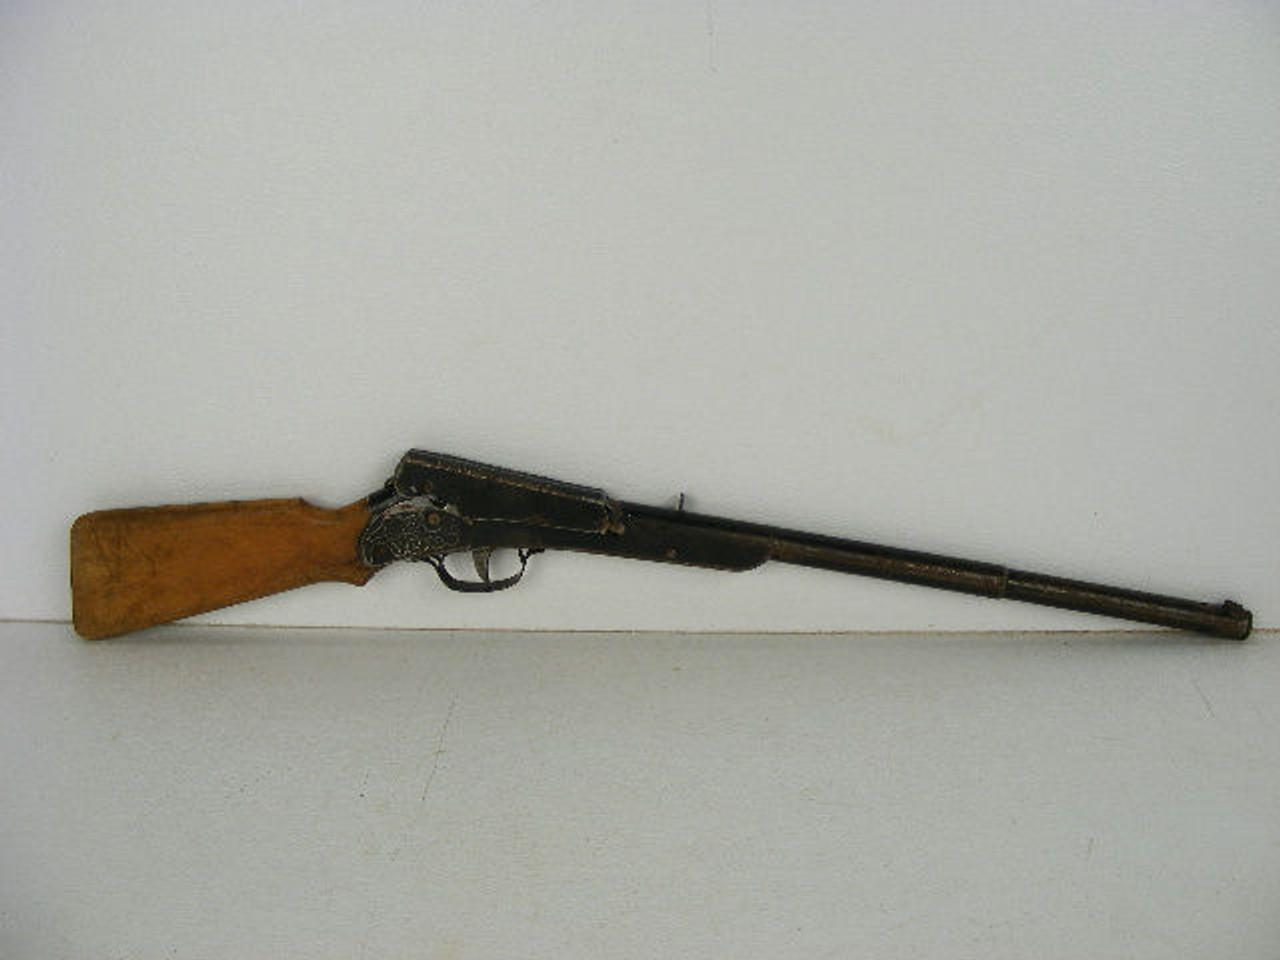 An original old Daisy BB gun No  106 marked Plymouth,Michigan that still  works